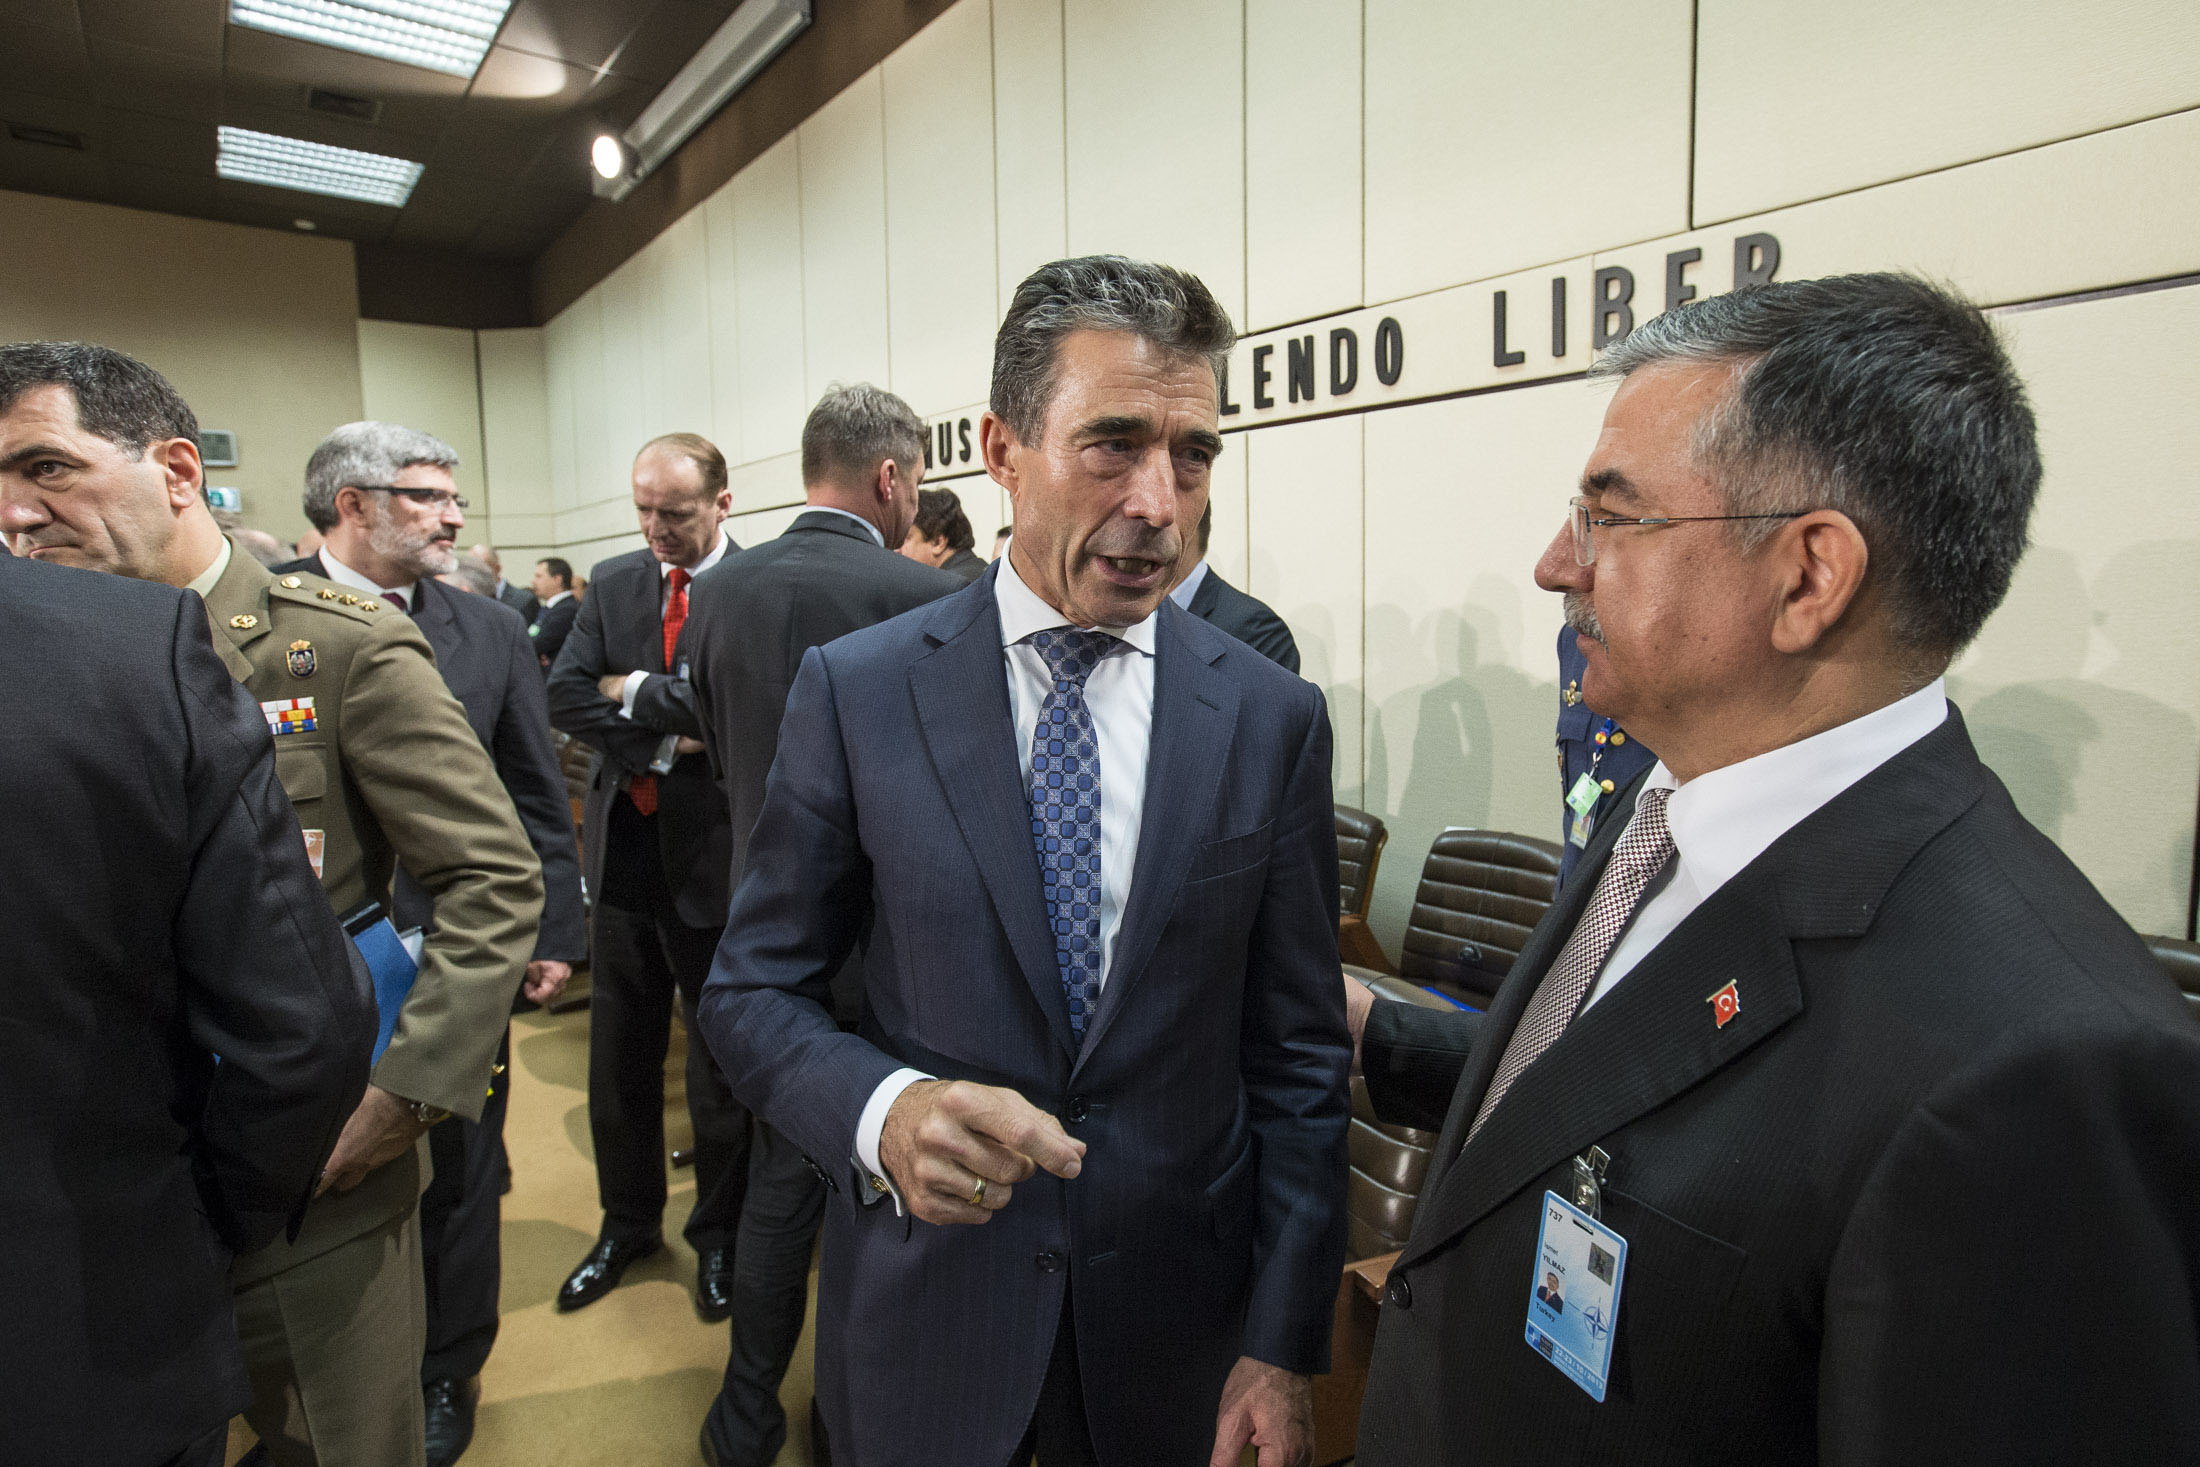 NATO Secretary General Anders Fogh Rasmussen and Turkey's Minister of Defense Ismet Yilmaz, October 22, 2013